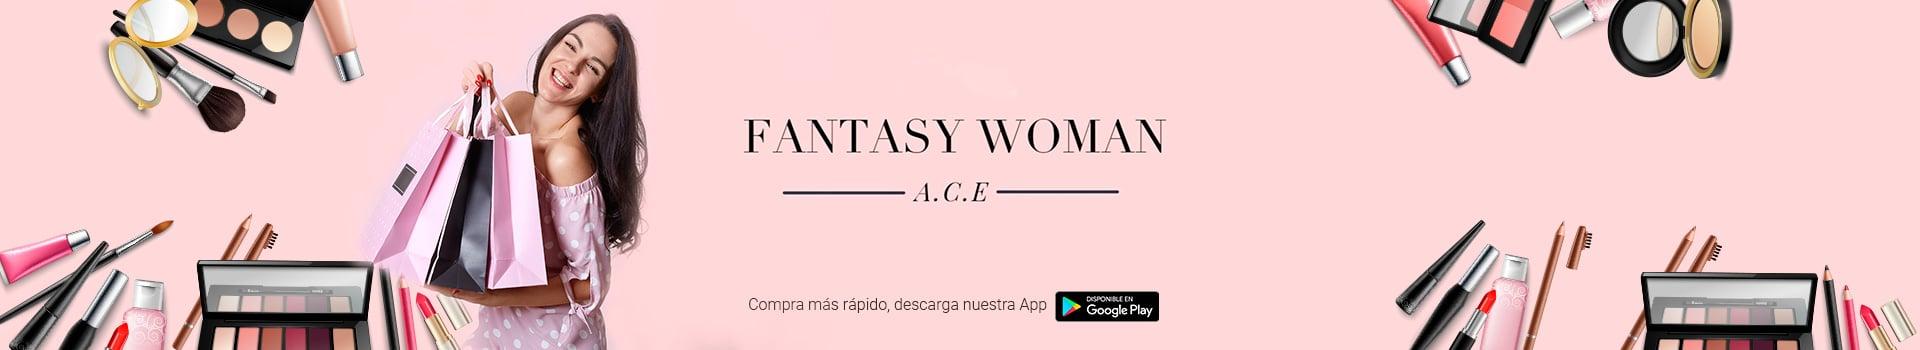 Fantasy Woman ACE